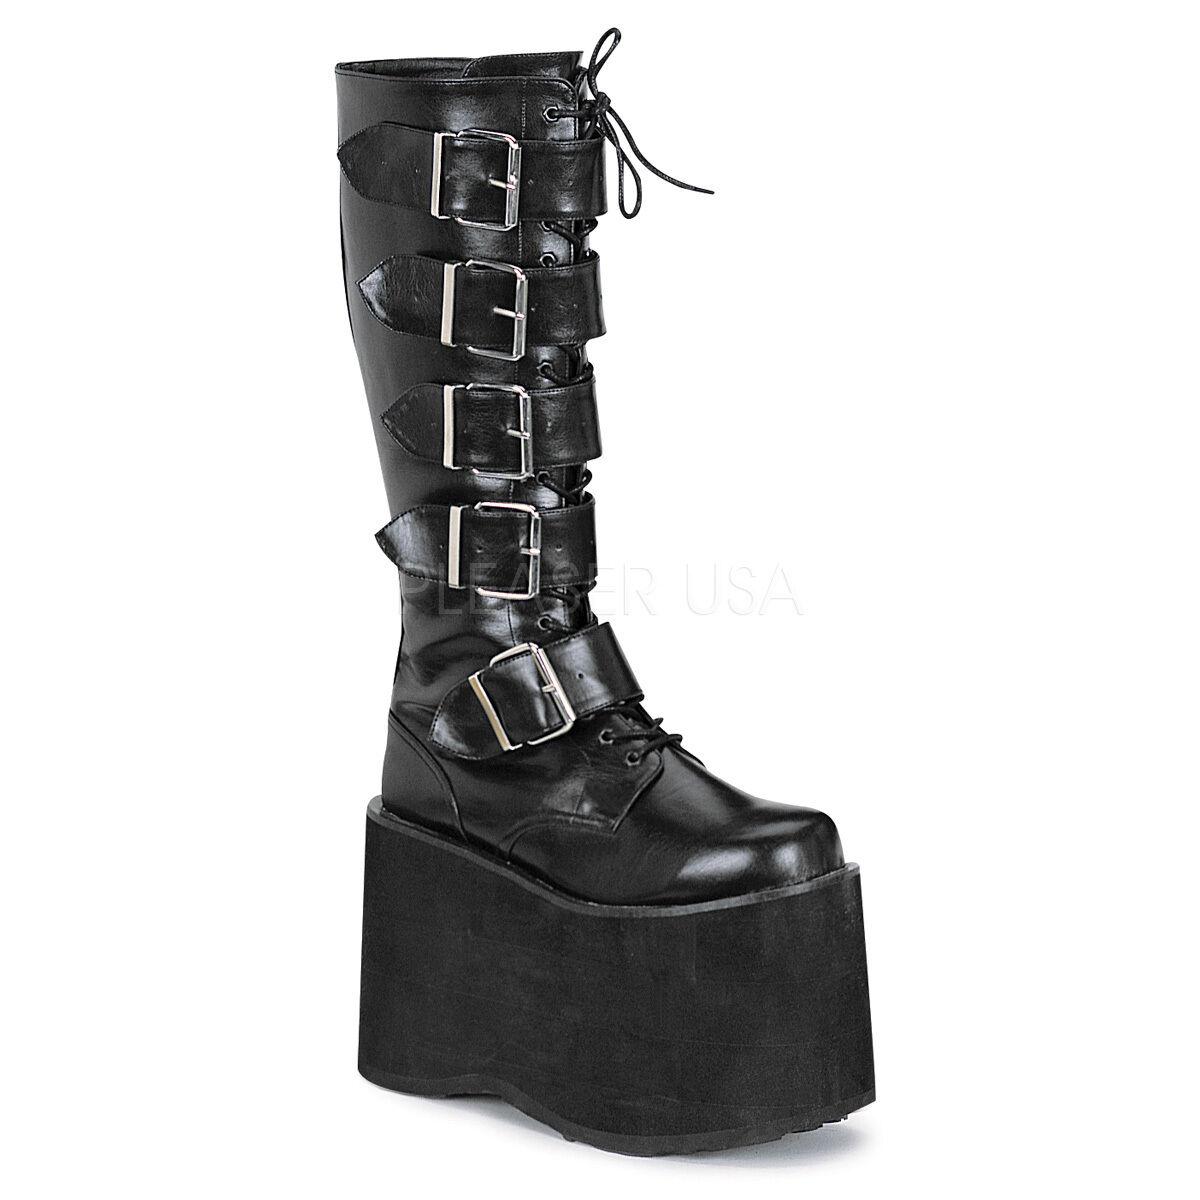 DEMONIA MEGA-618 Women's Punk Goth Huge Platform Black Industrial Gothic Boots